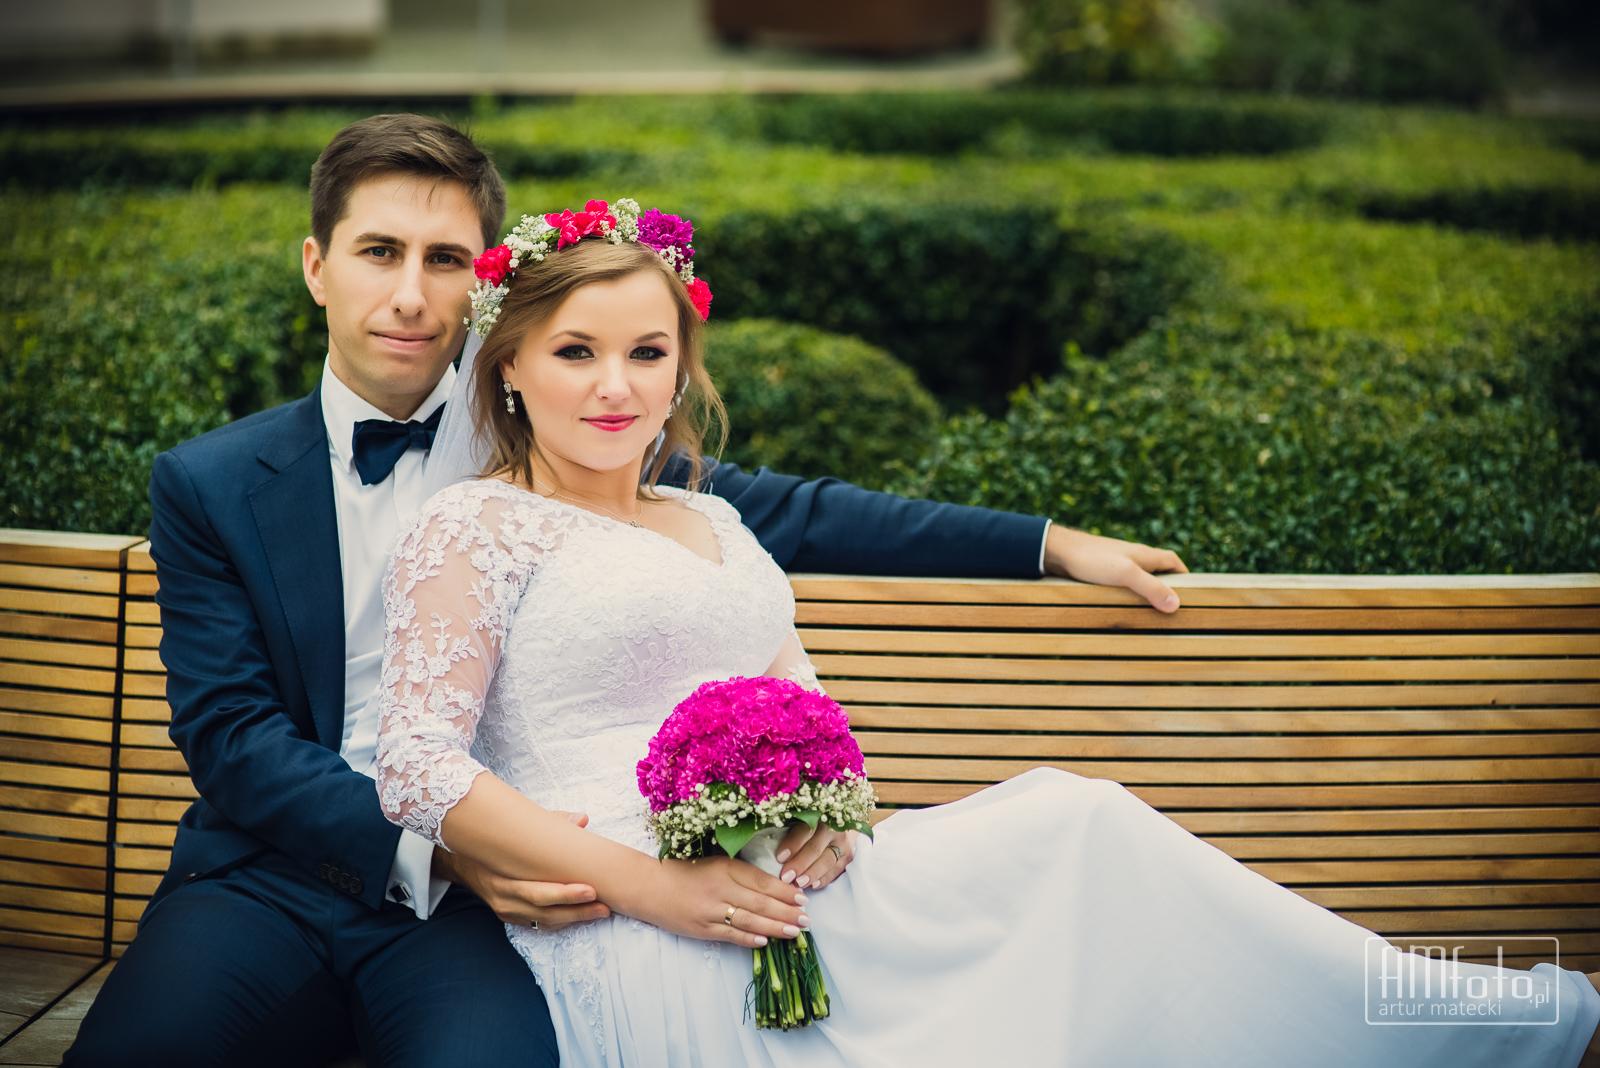 0254_Ilona&Marek_sesja_poslubna_plener_slubny_poznan____www-amfoto-pl__AMF_4070.jpg